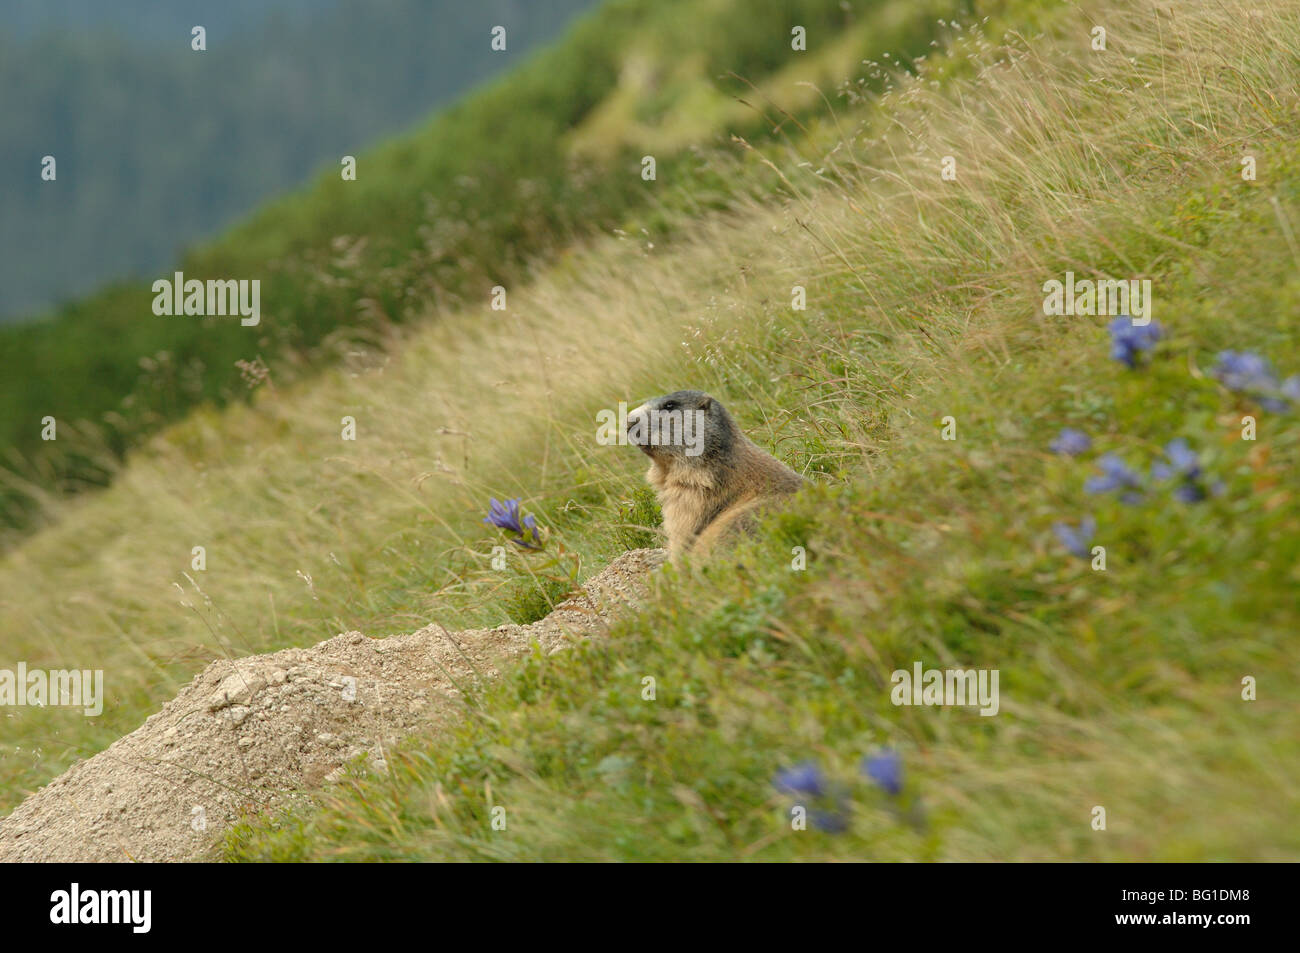 The Slovak sub species of the Alpine Marmot Marmota marmota tatrica in siroka dolina valley in the low tatra mountains - Stock Image